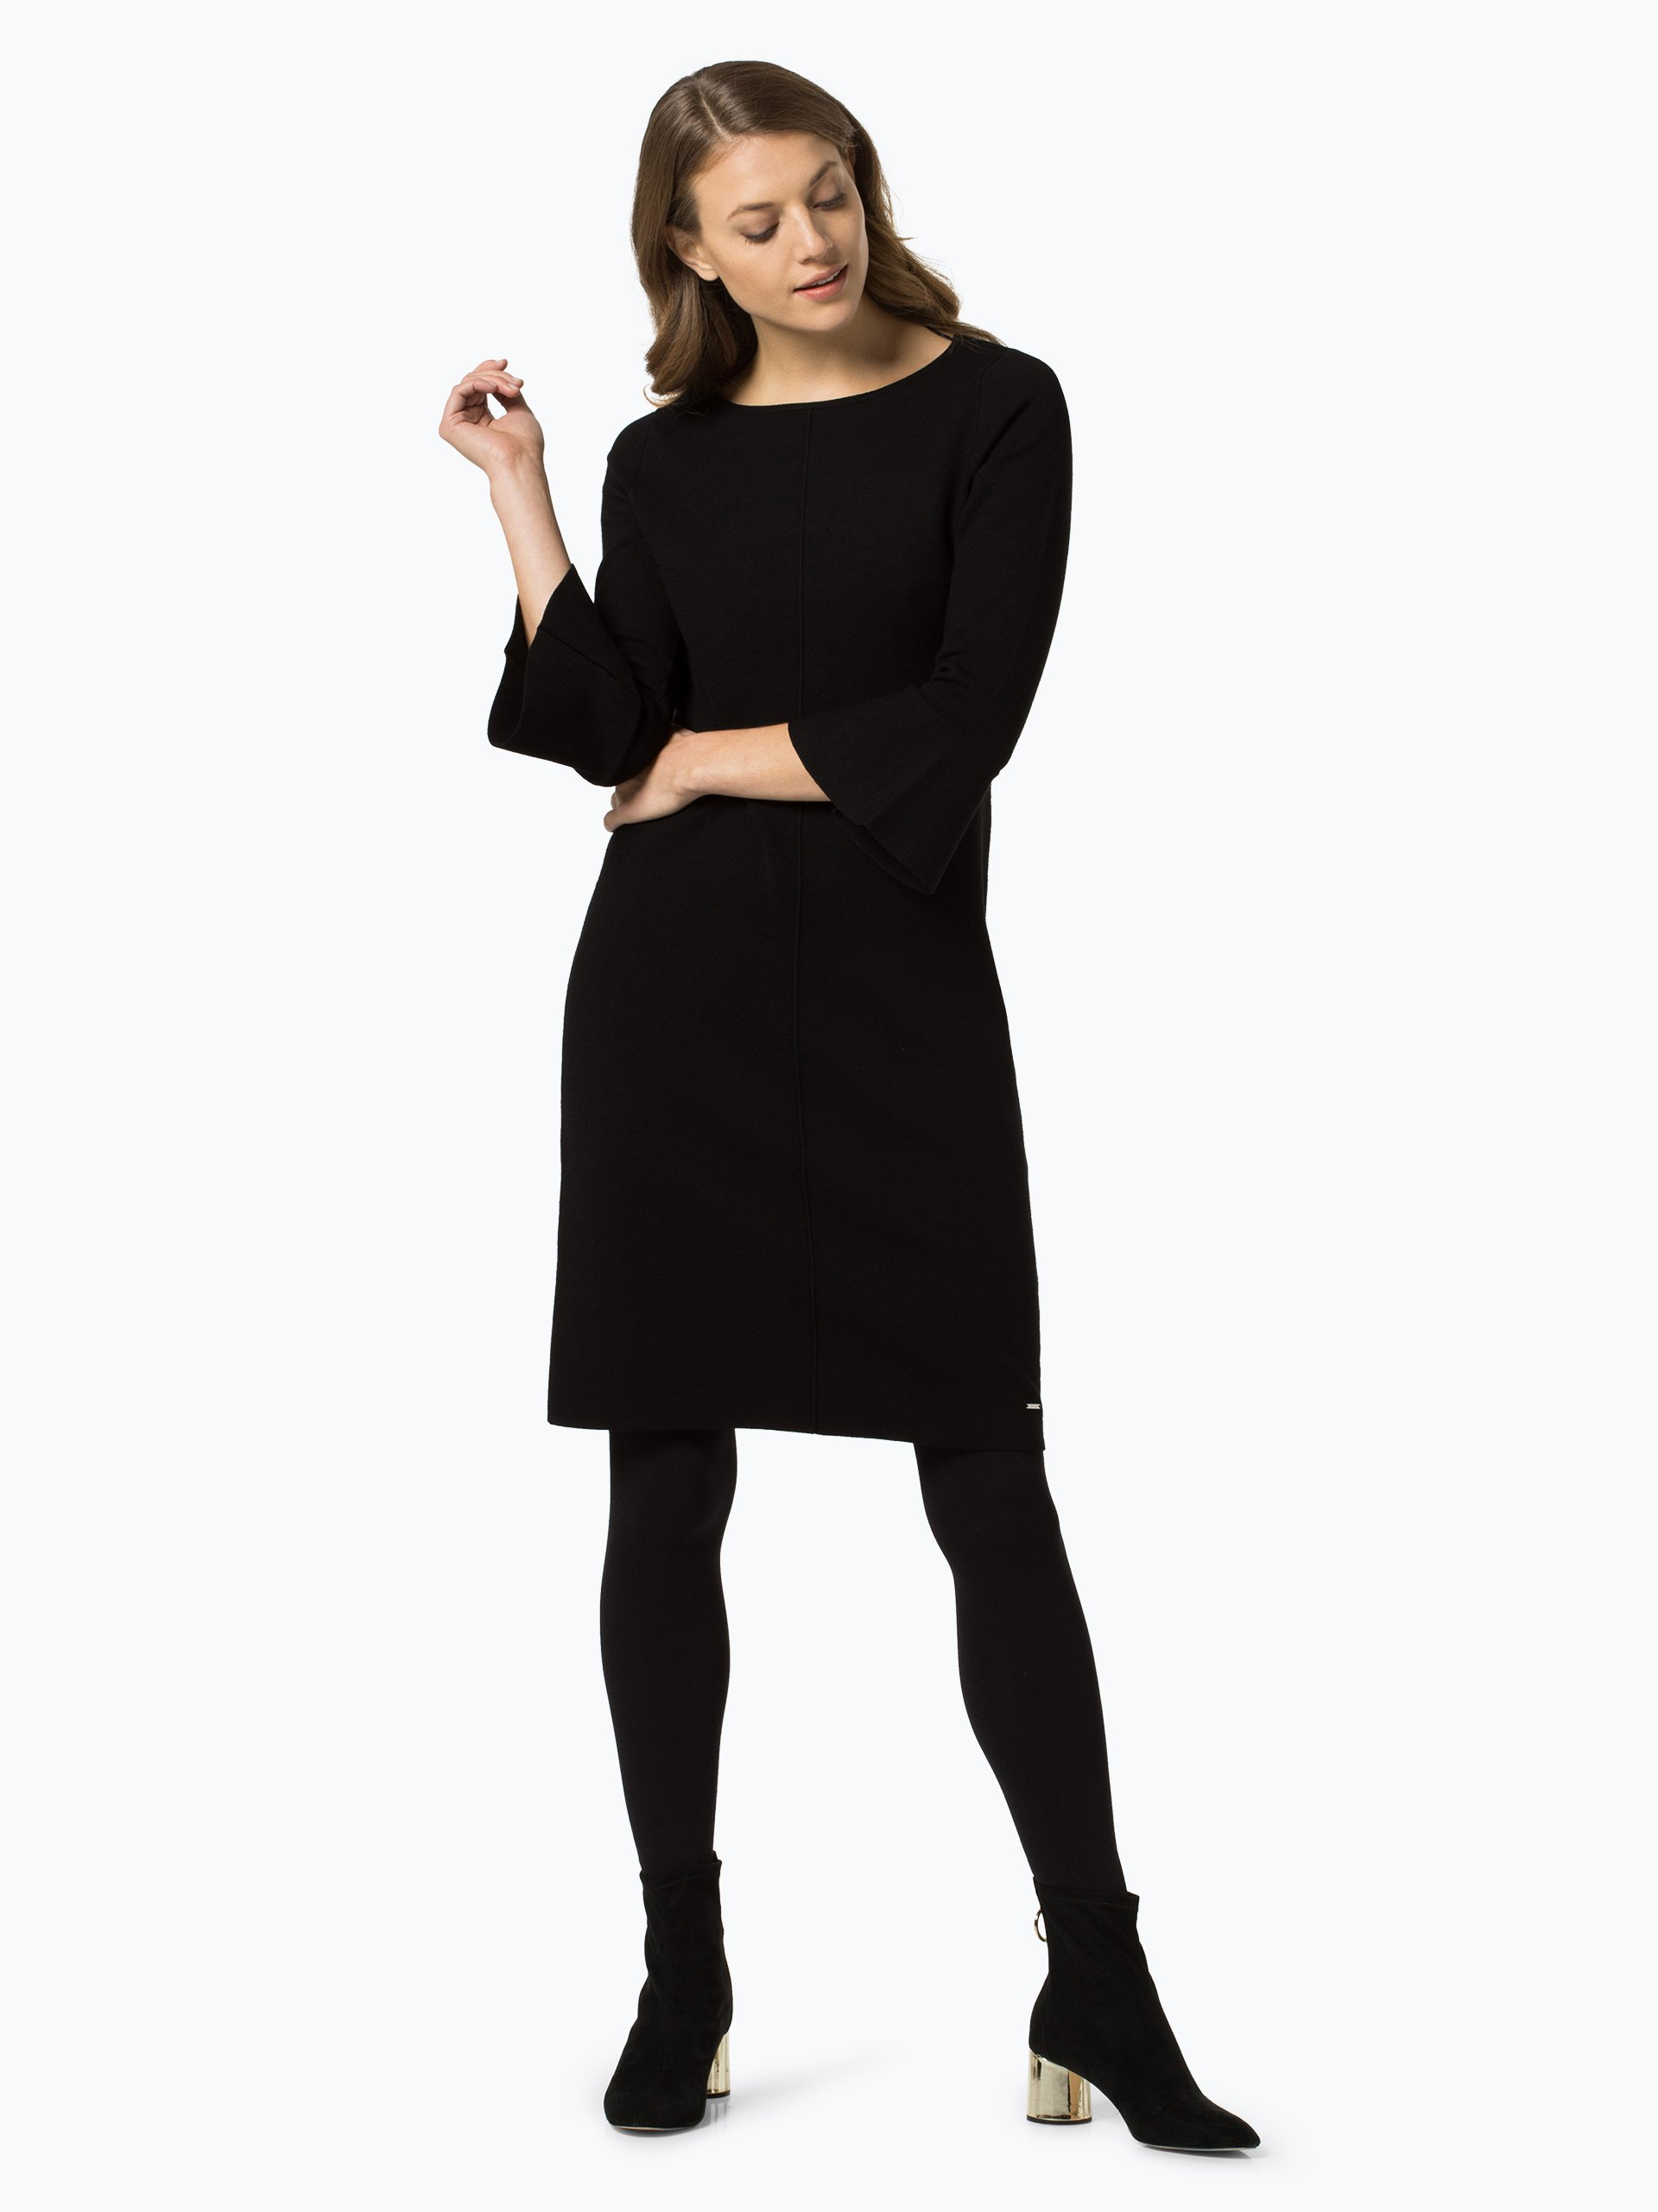 taifun damen kleid schwarz uni online kaufen vangraaf com. Black Bedroom Furniture Sets. Home Design Ideas